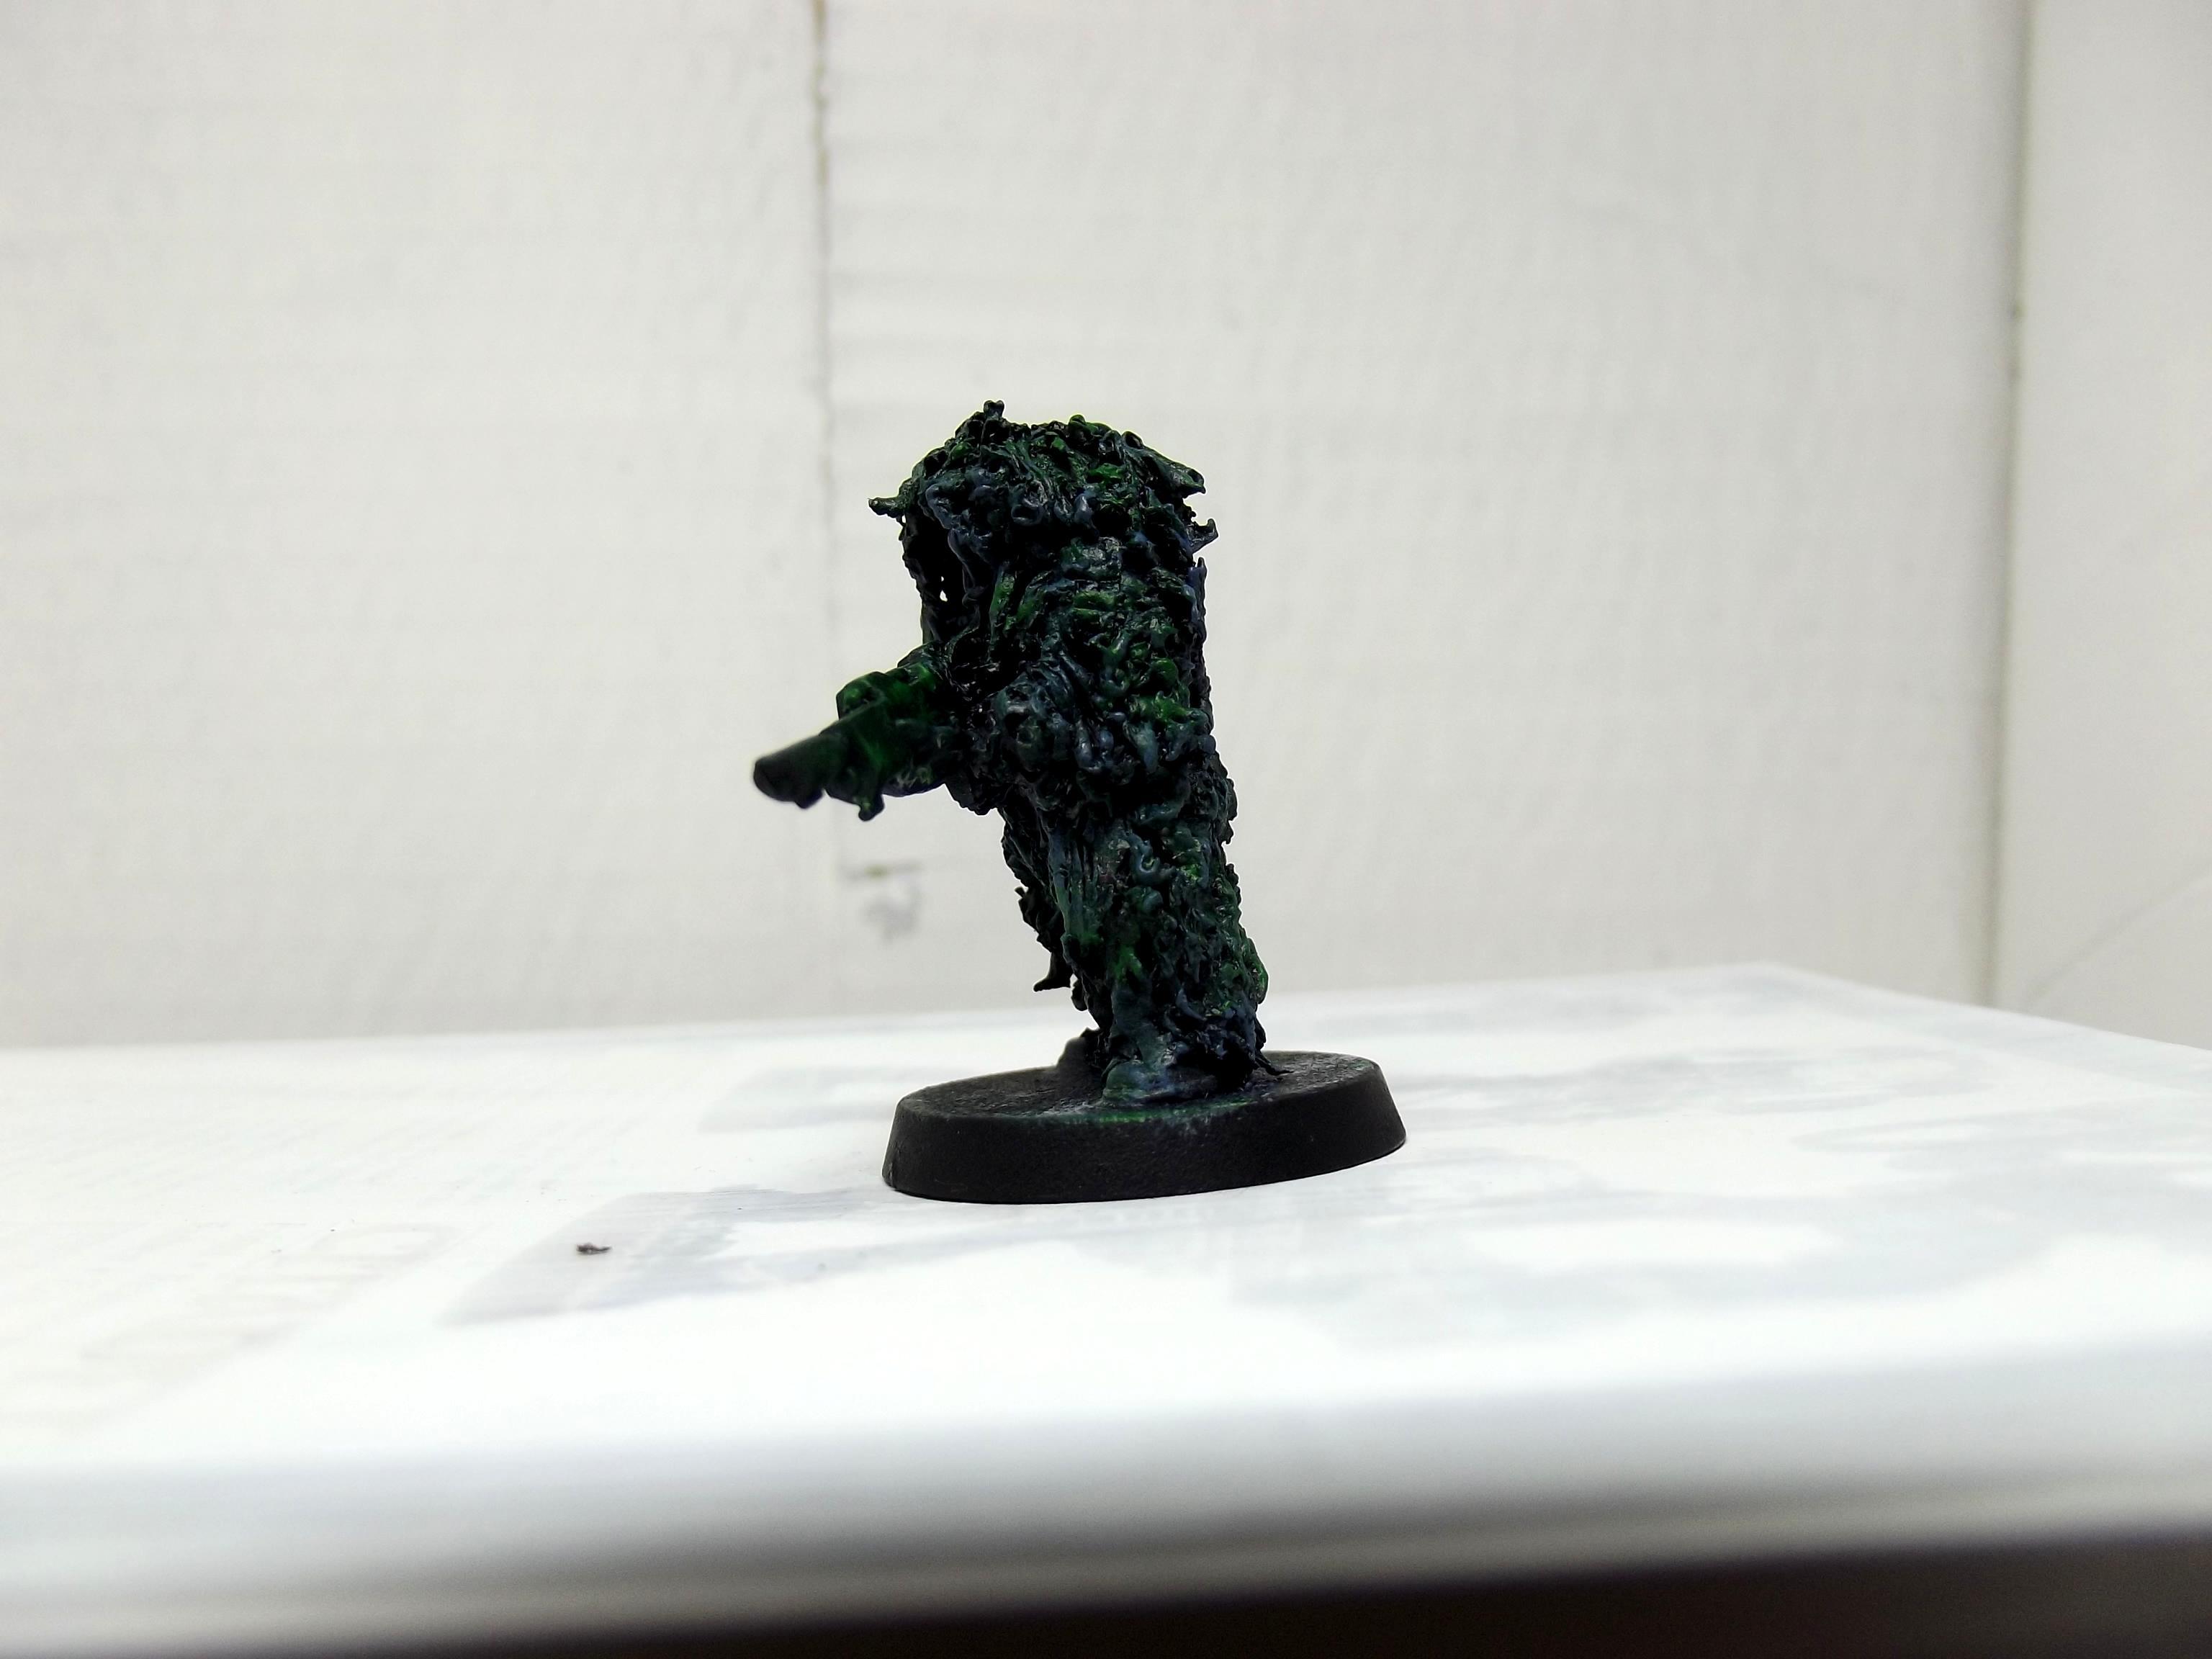 Swampy 1 painted